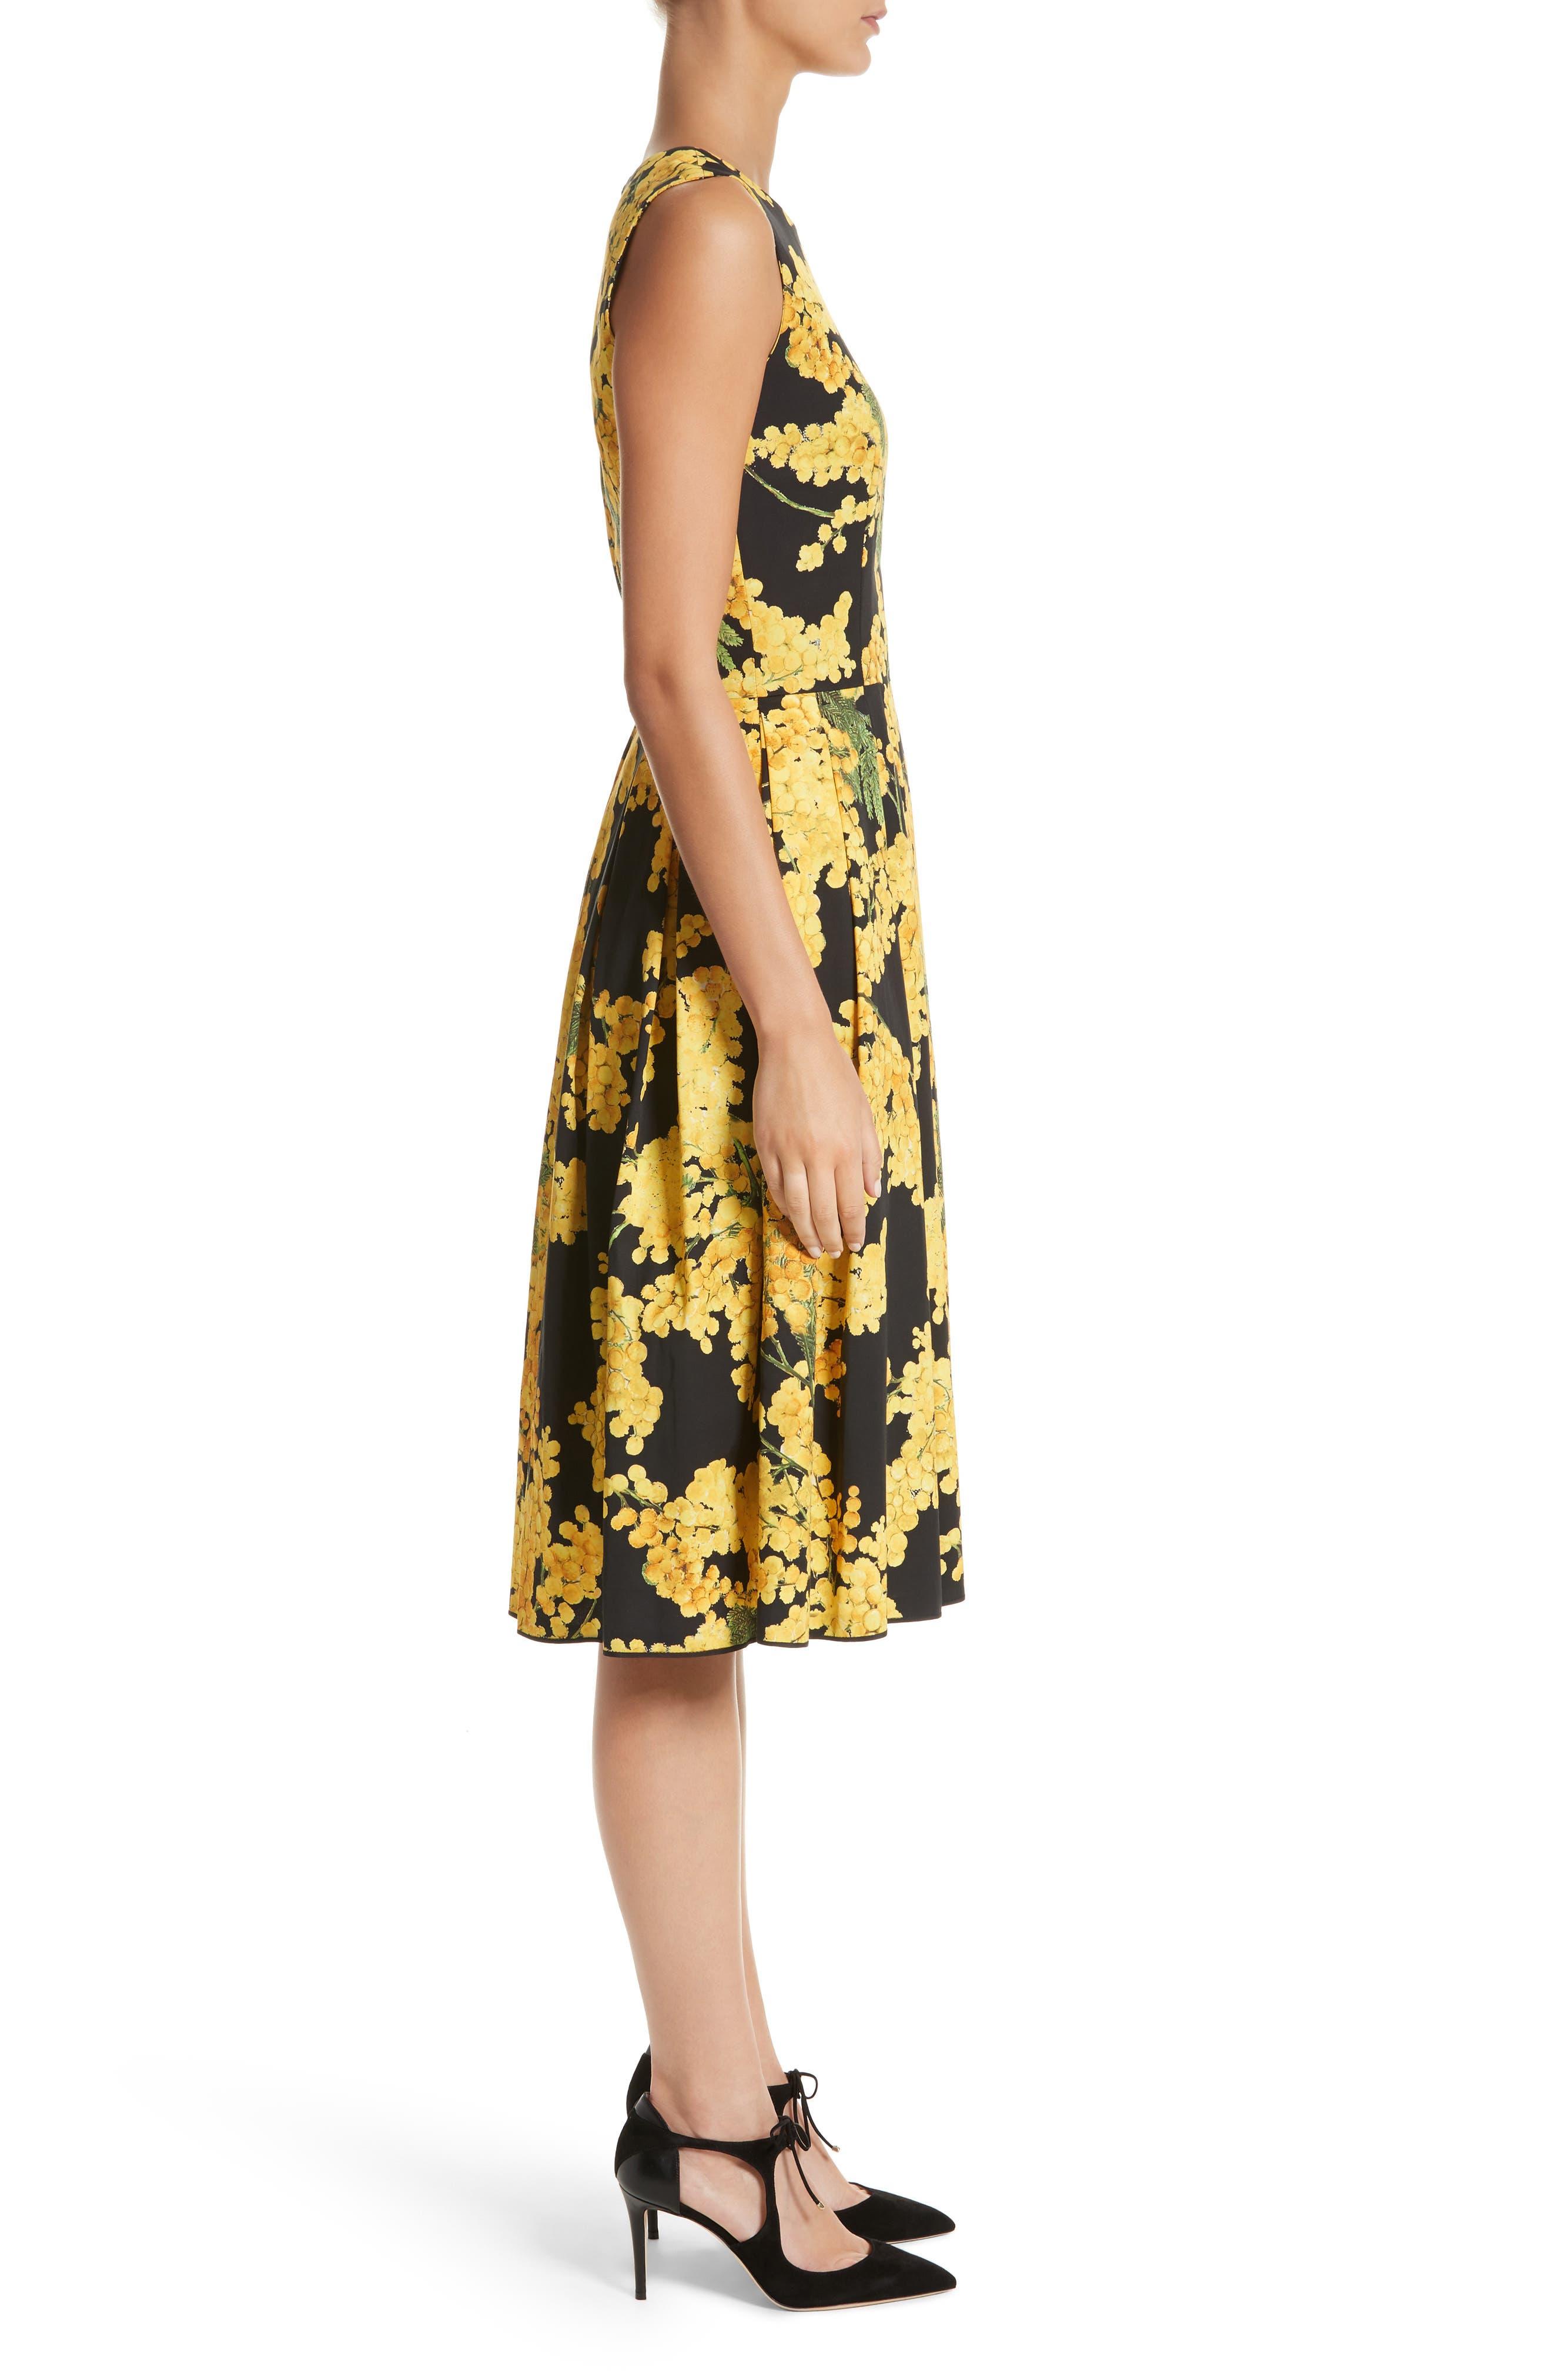 Floral Print Faille Day Dress,                             Alternate thumbnail 3, color,                             Freesia Yellow/Black